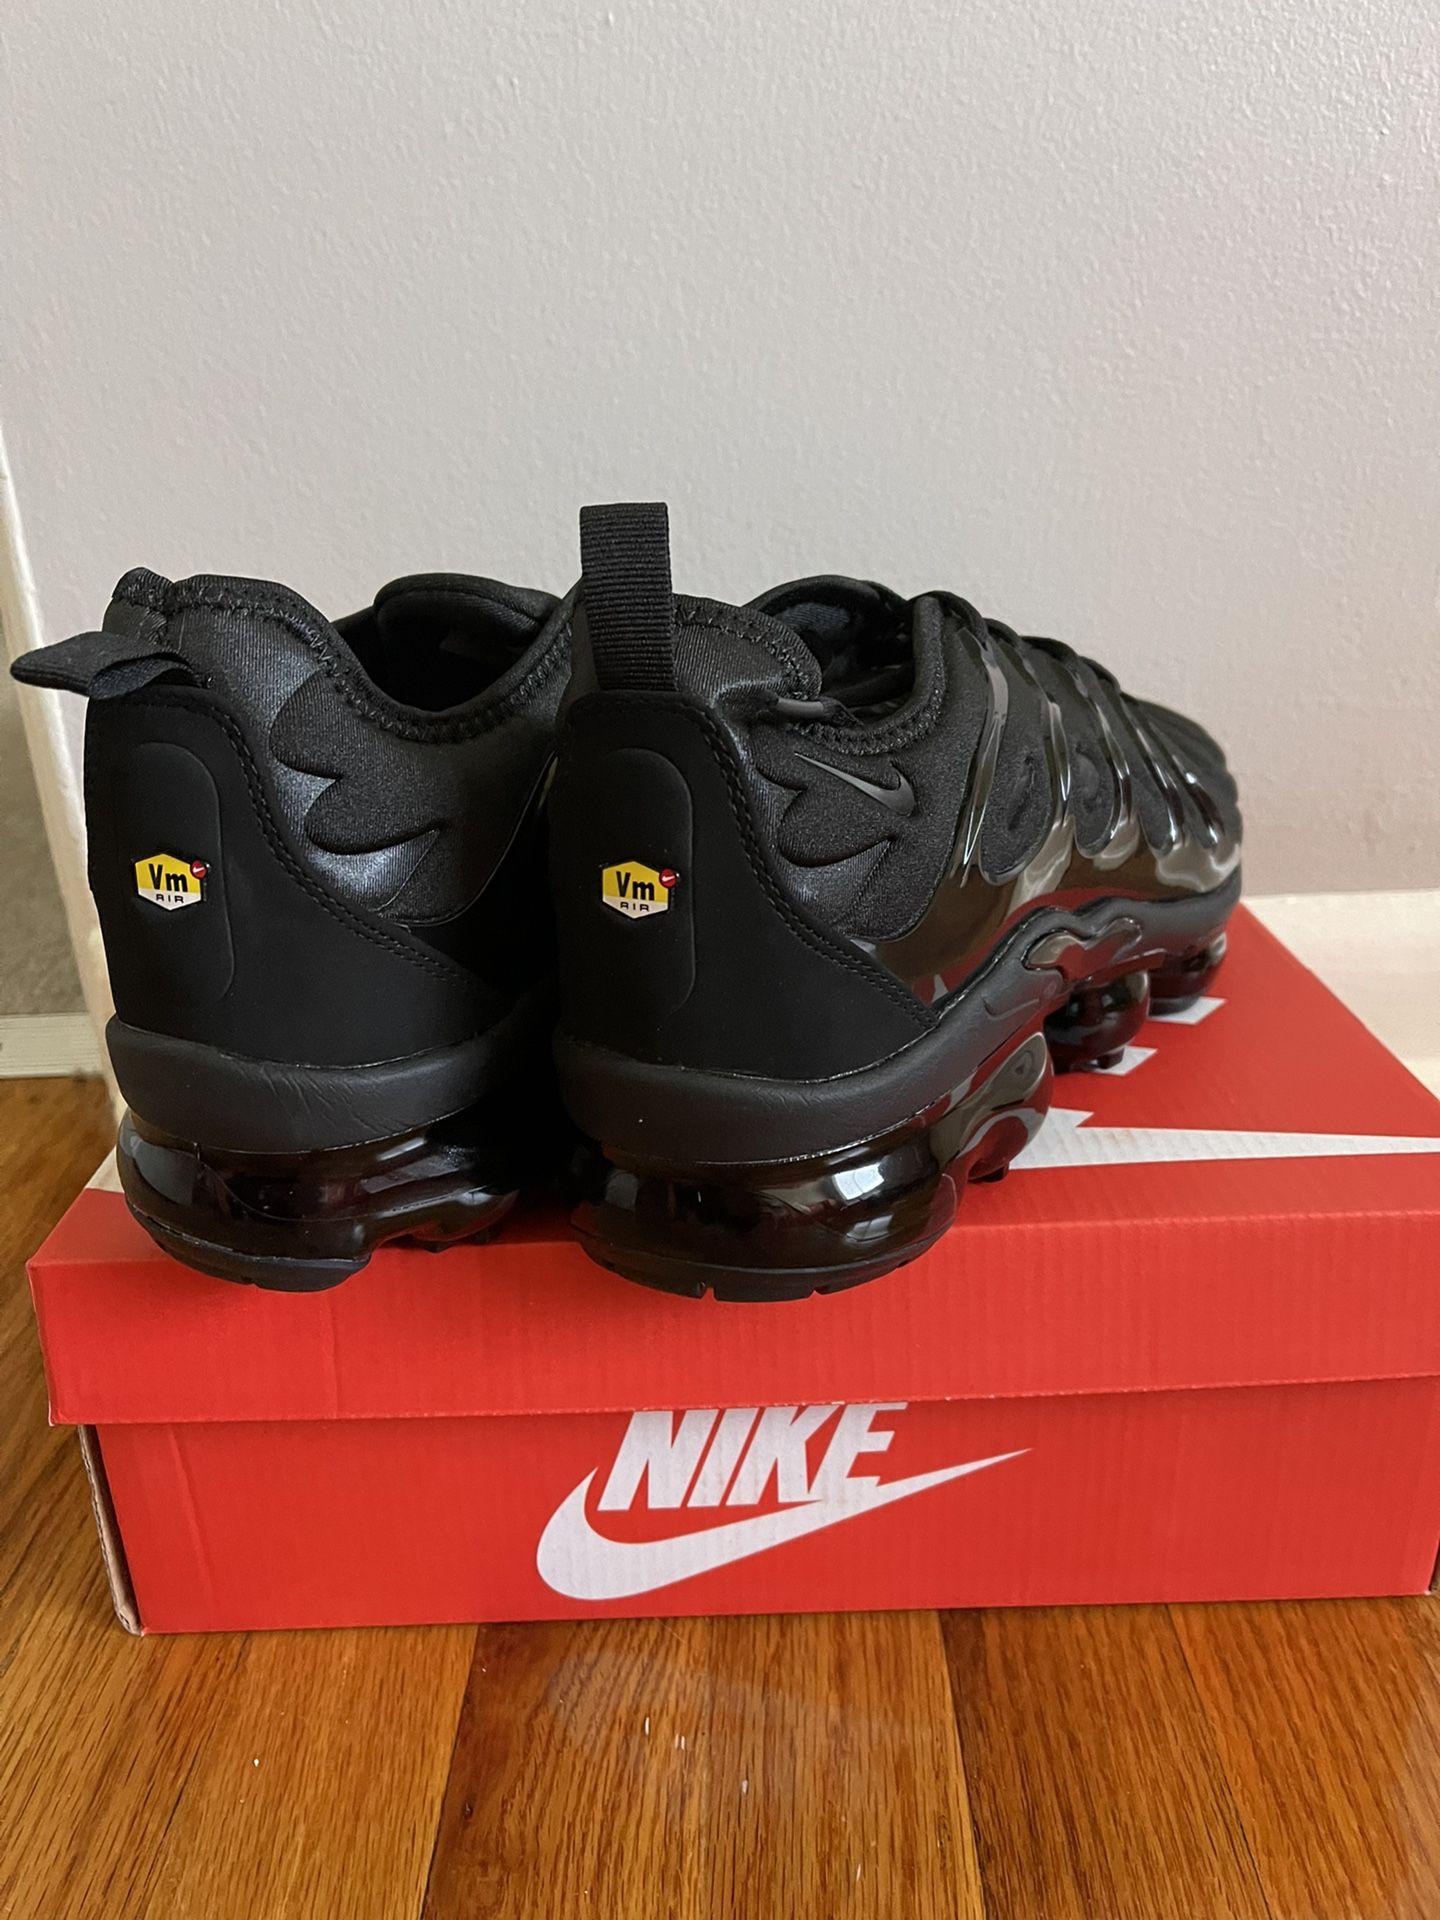 Nike Vapor Max Size 12.5 13